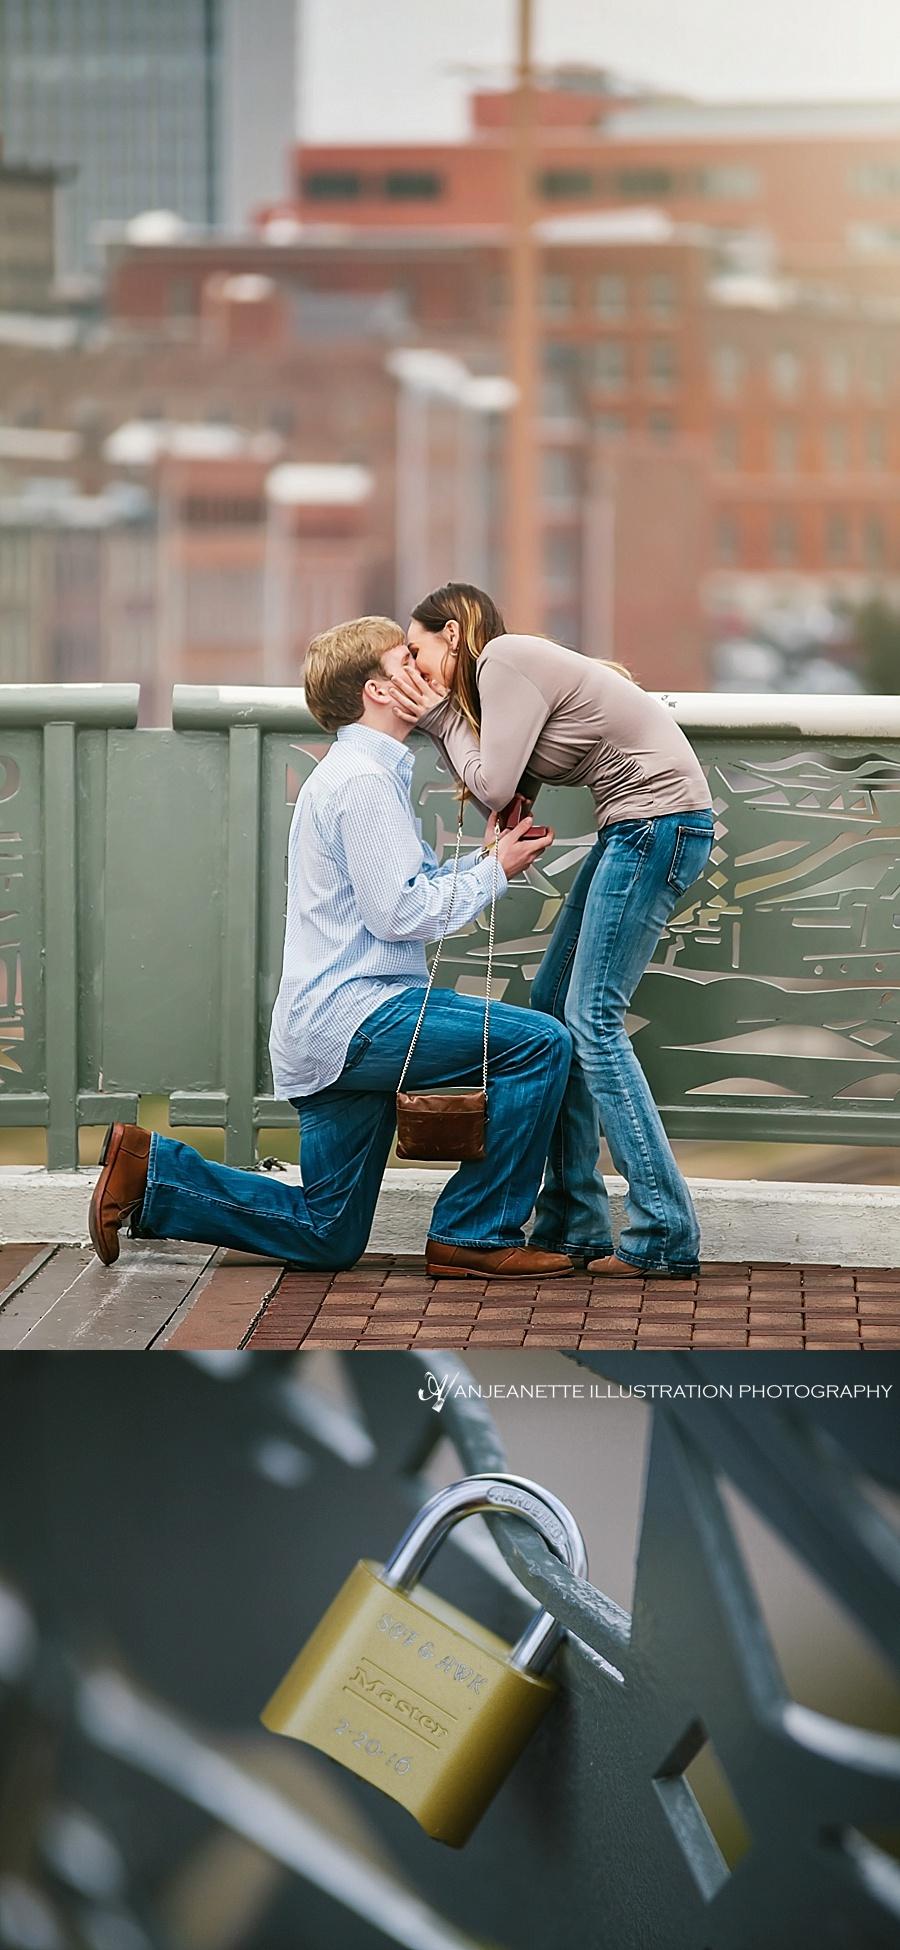 Nashville Artistic Proposal Photographer Anjeanette Illustration Photography